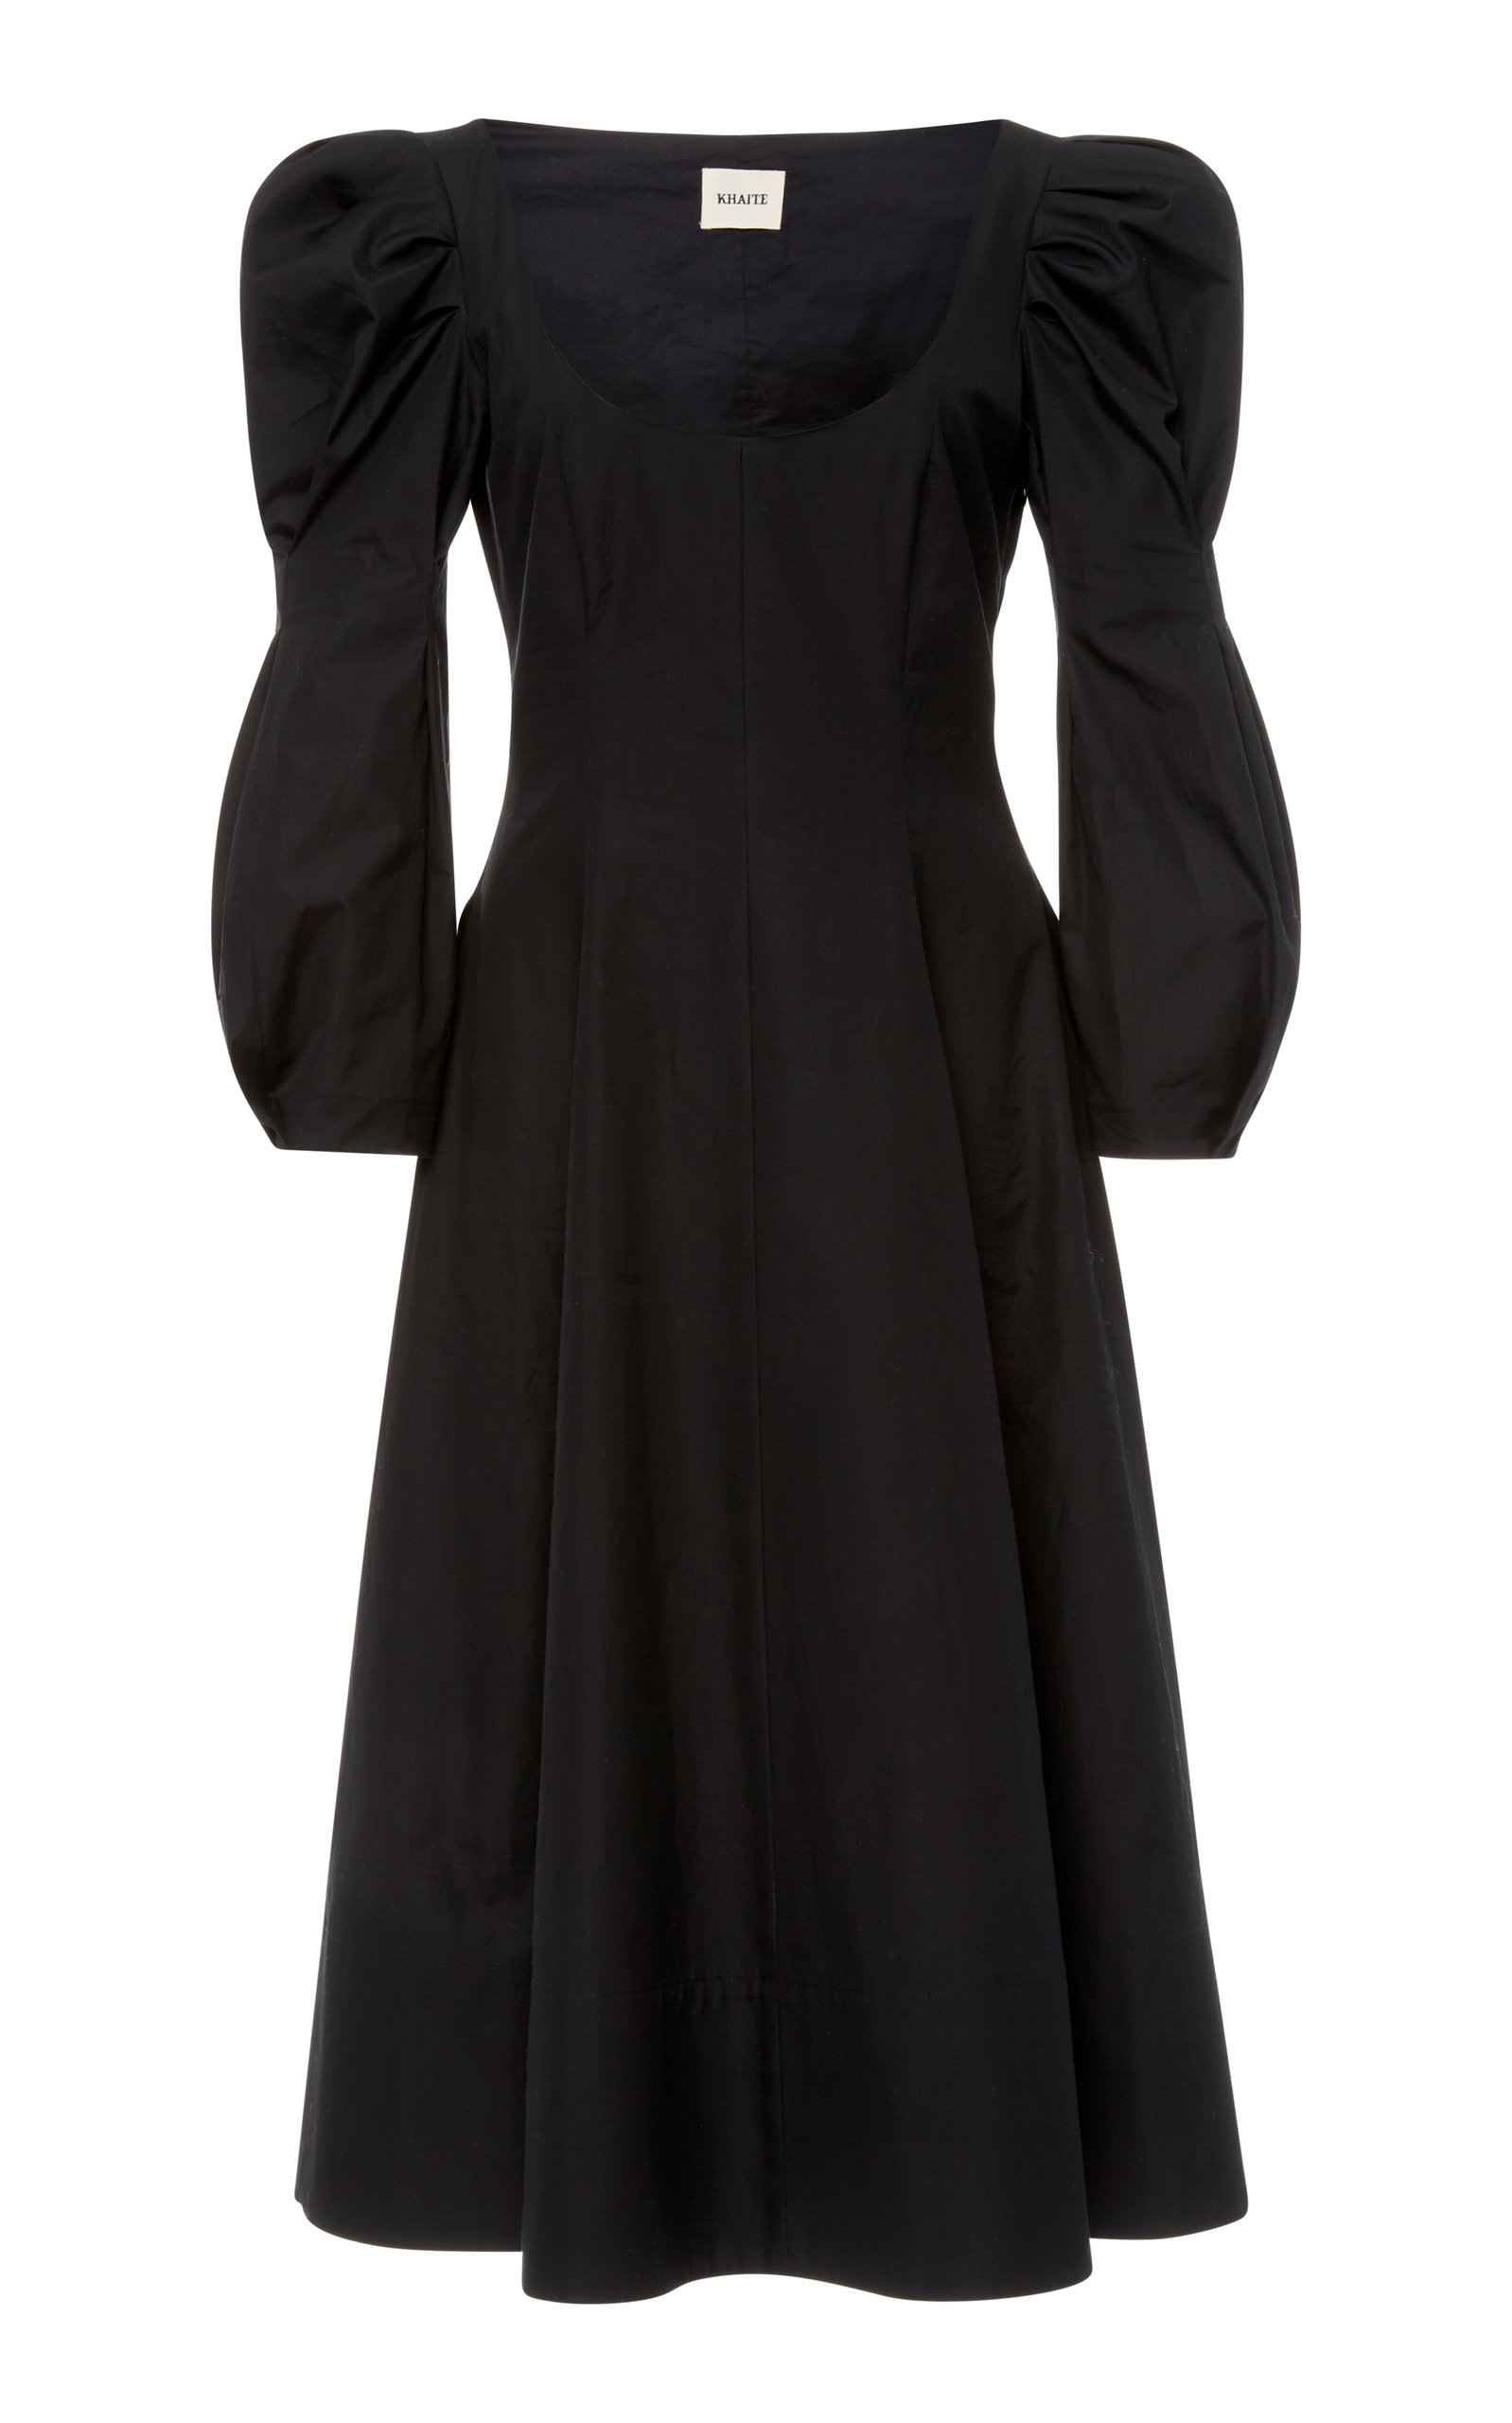 EDWINA BLACK COTTON POPLIN DRESS